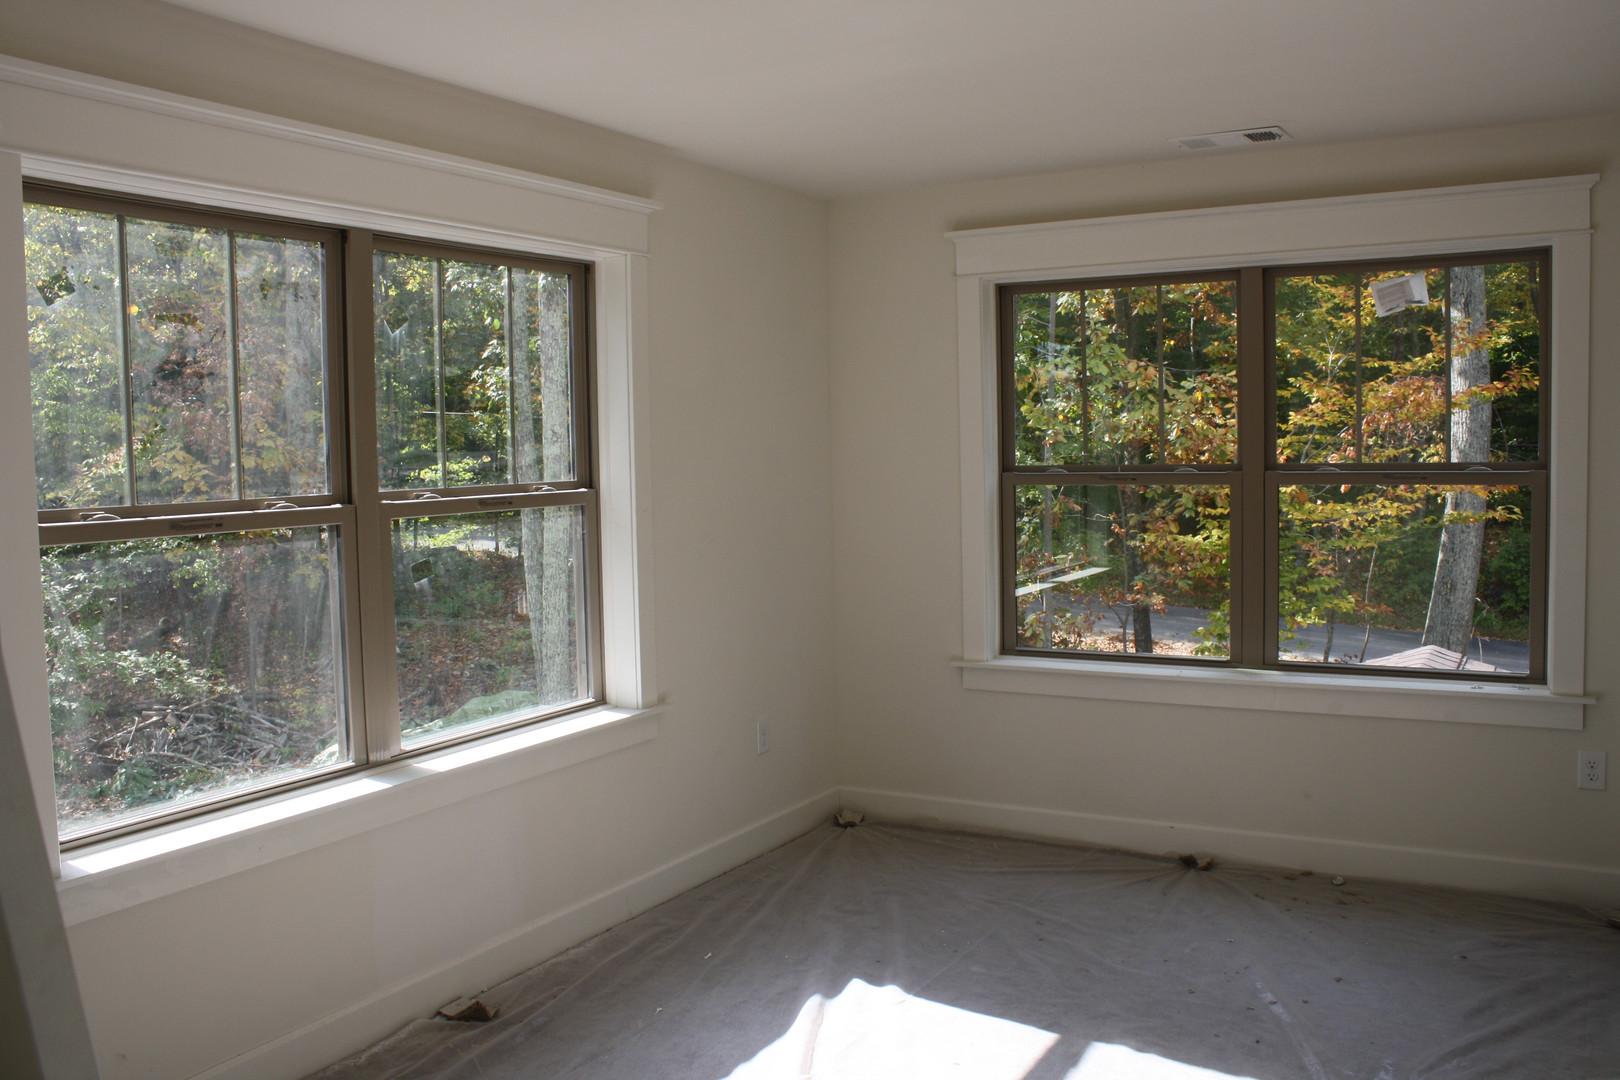 Window Grids